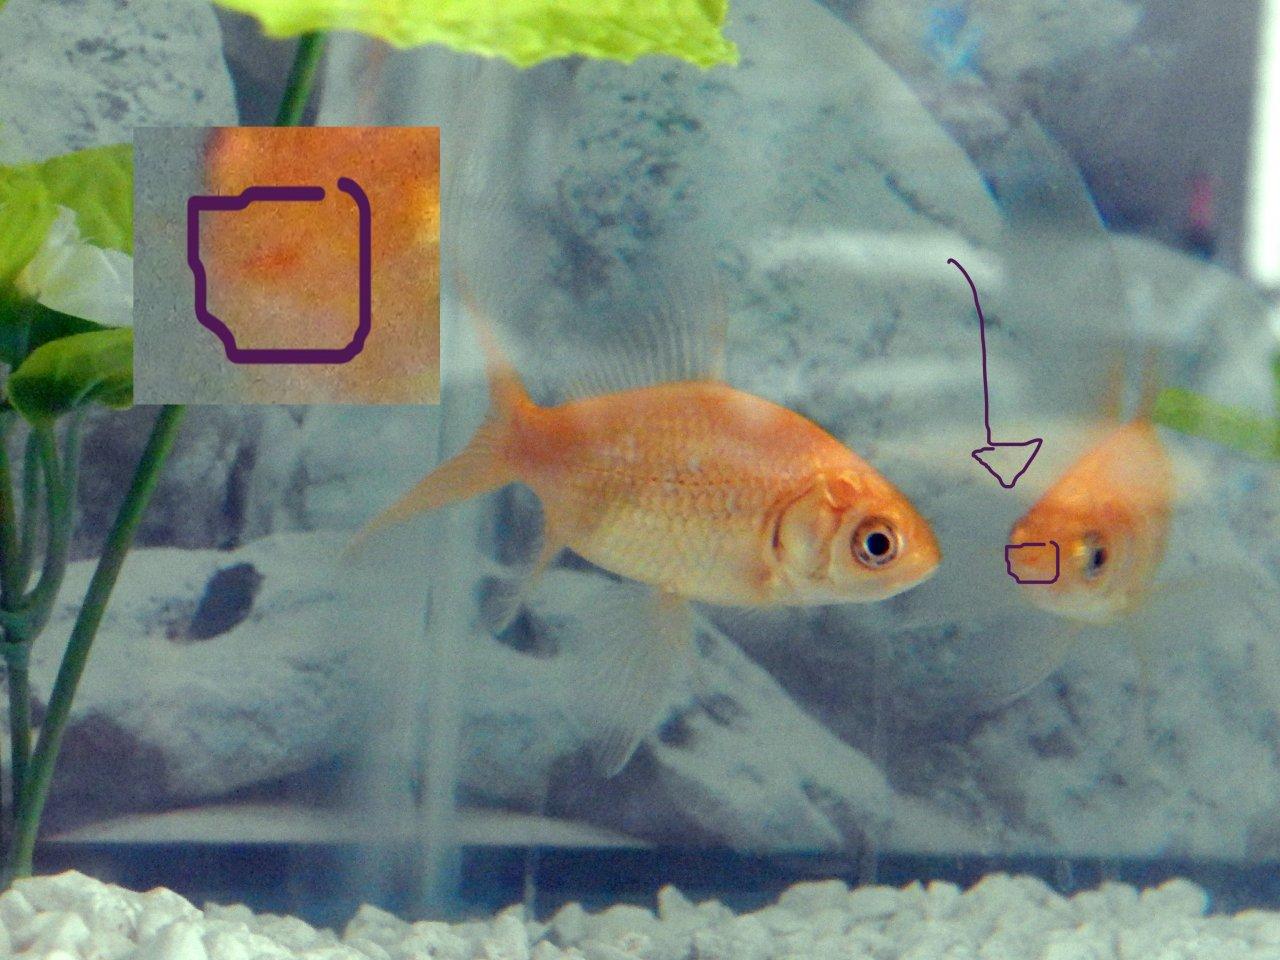 Fish aquarium red spots - Fish Aquarium Red Spots